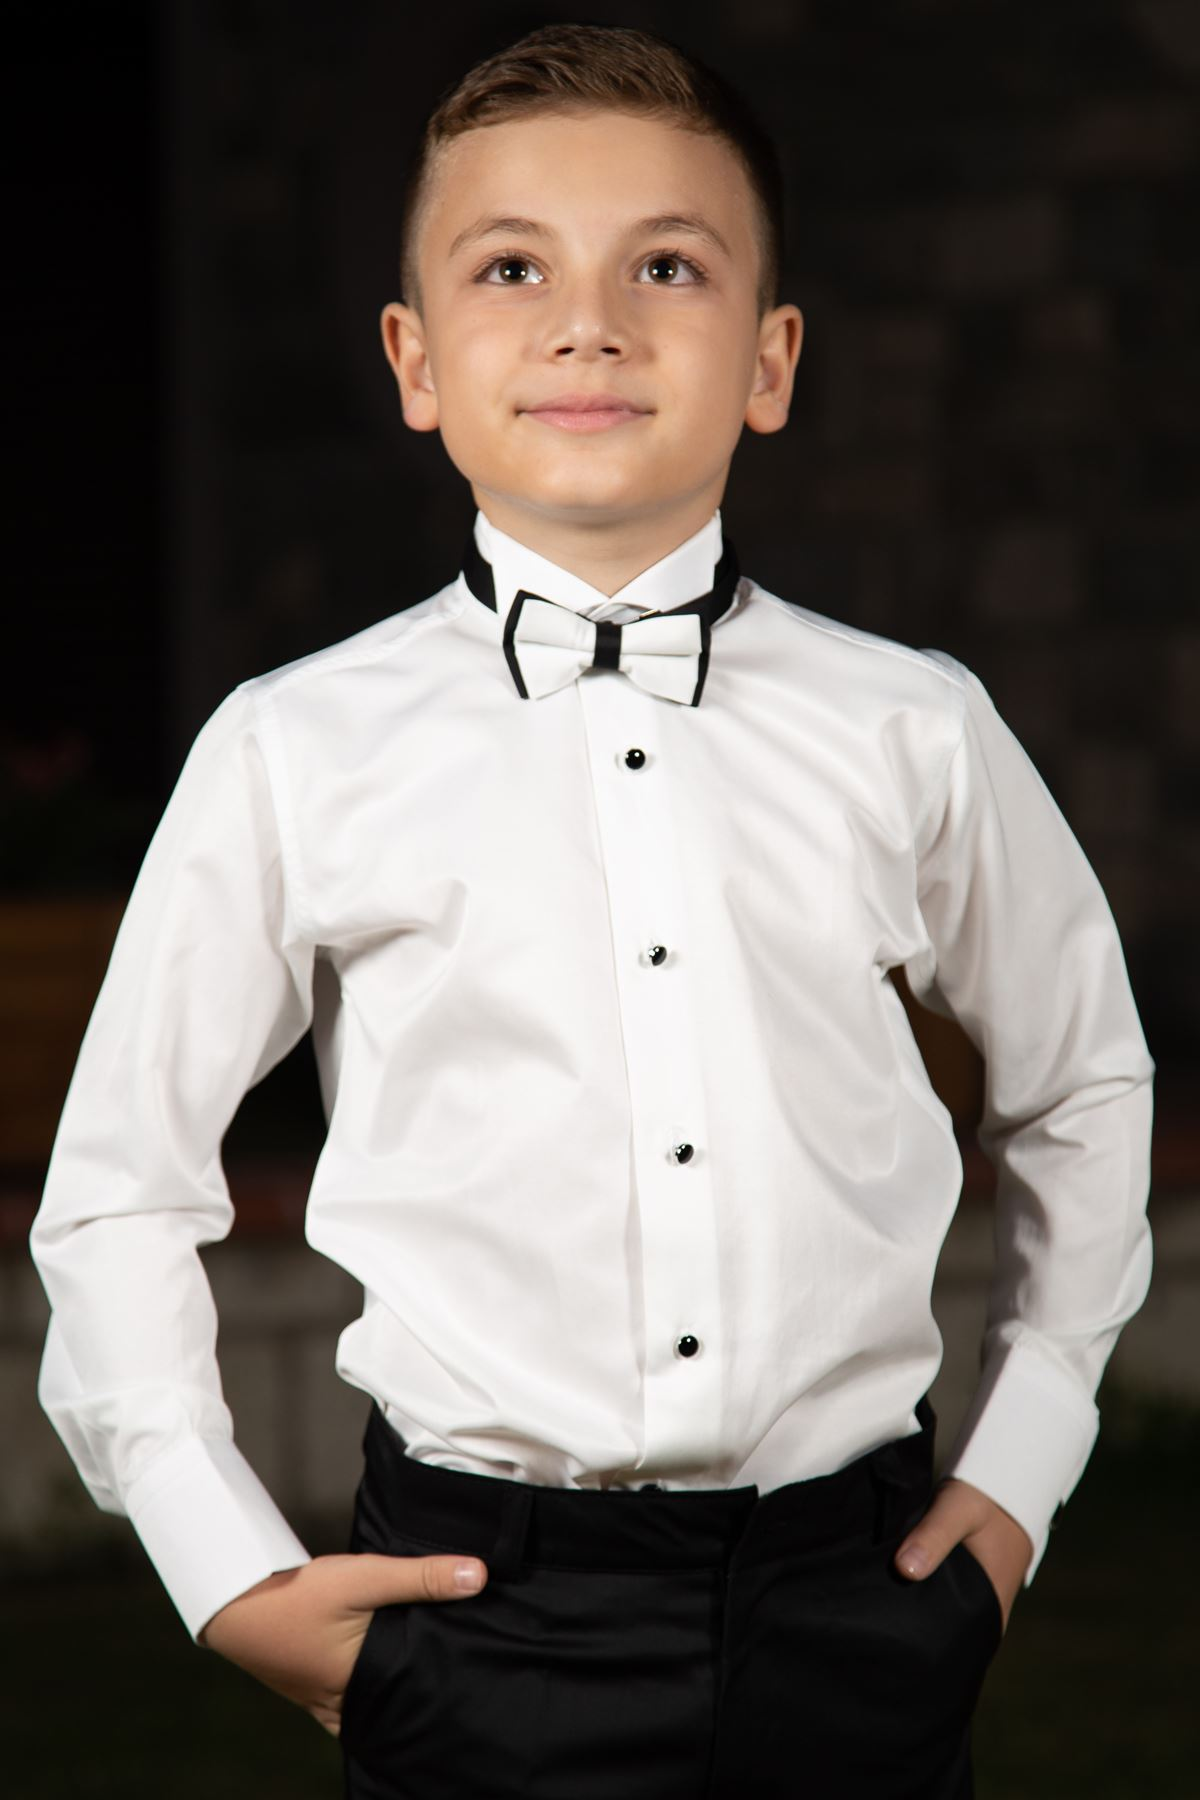 Horseshoe collar, black cufflinks, Boys ' shirt 1003 cream